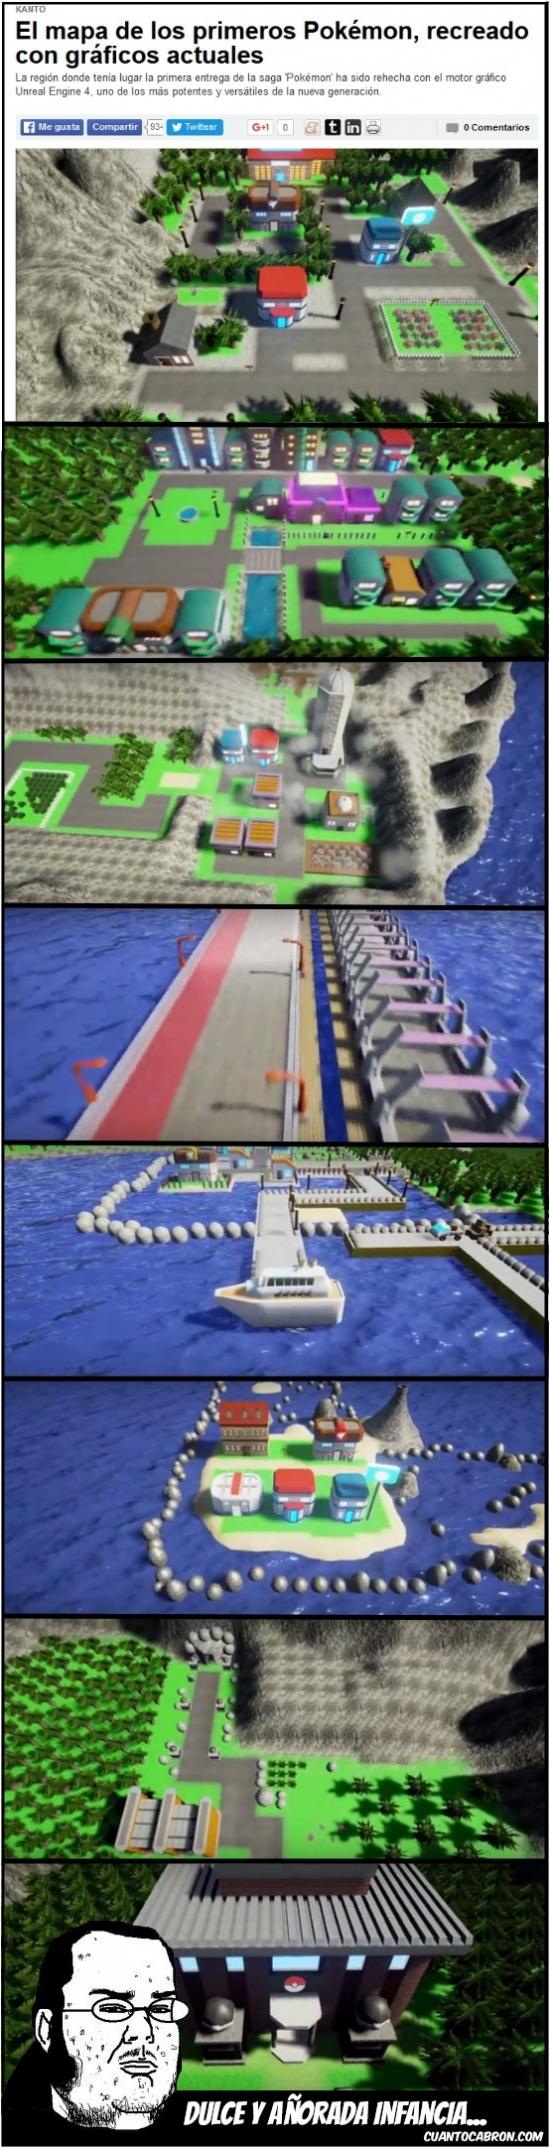 Friki - Kanto, en Unreal Engine 4